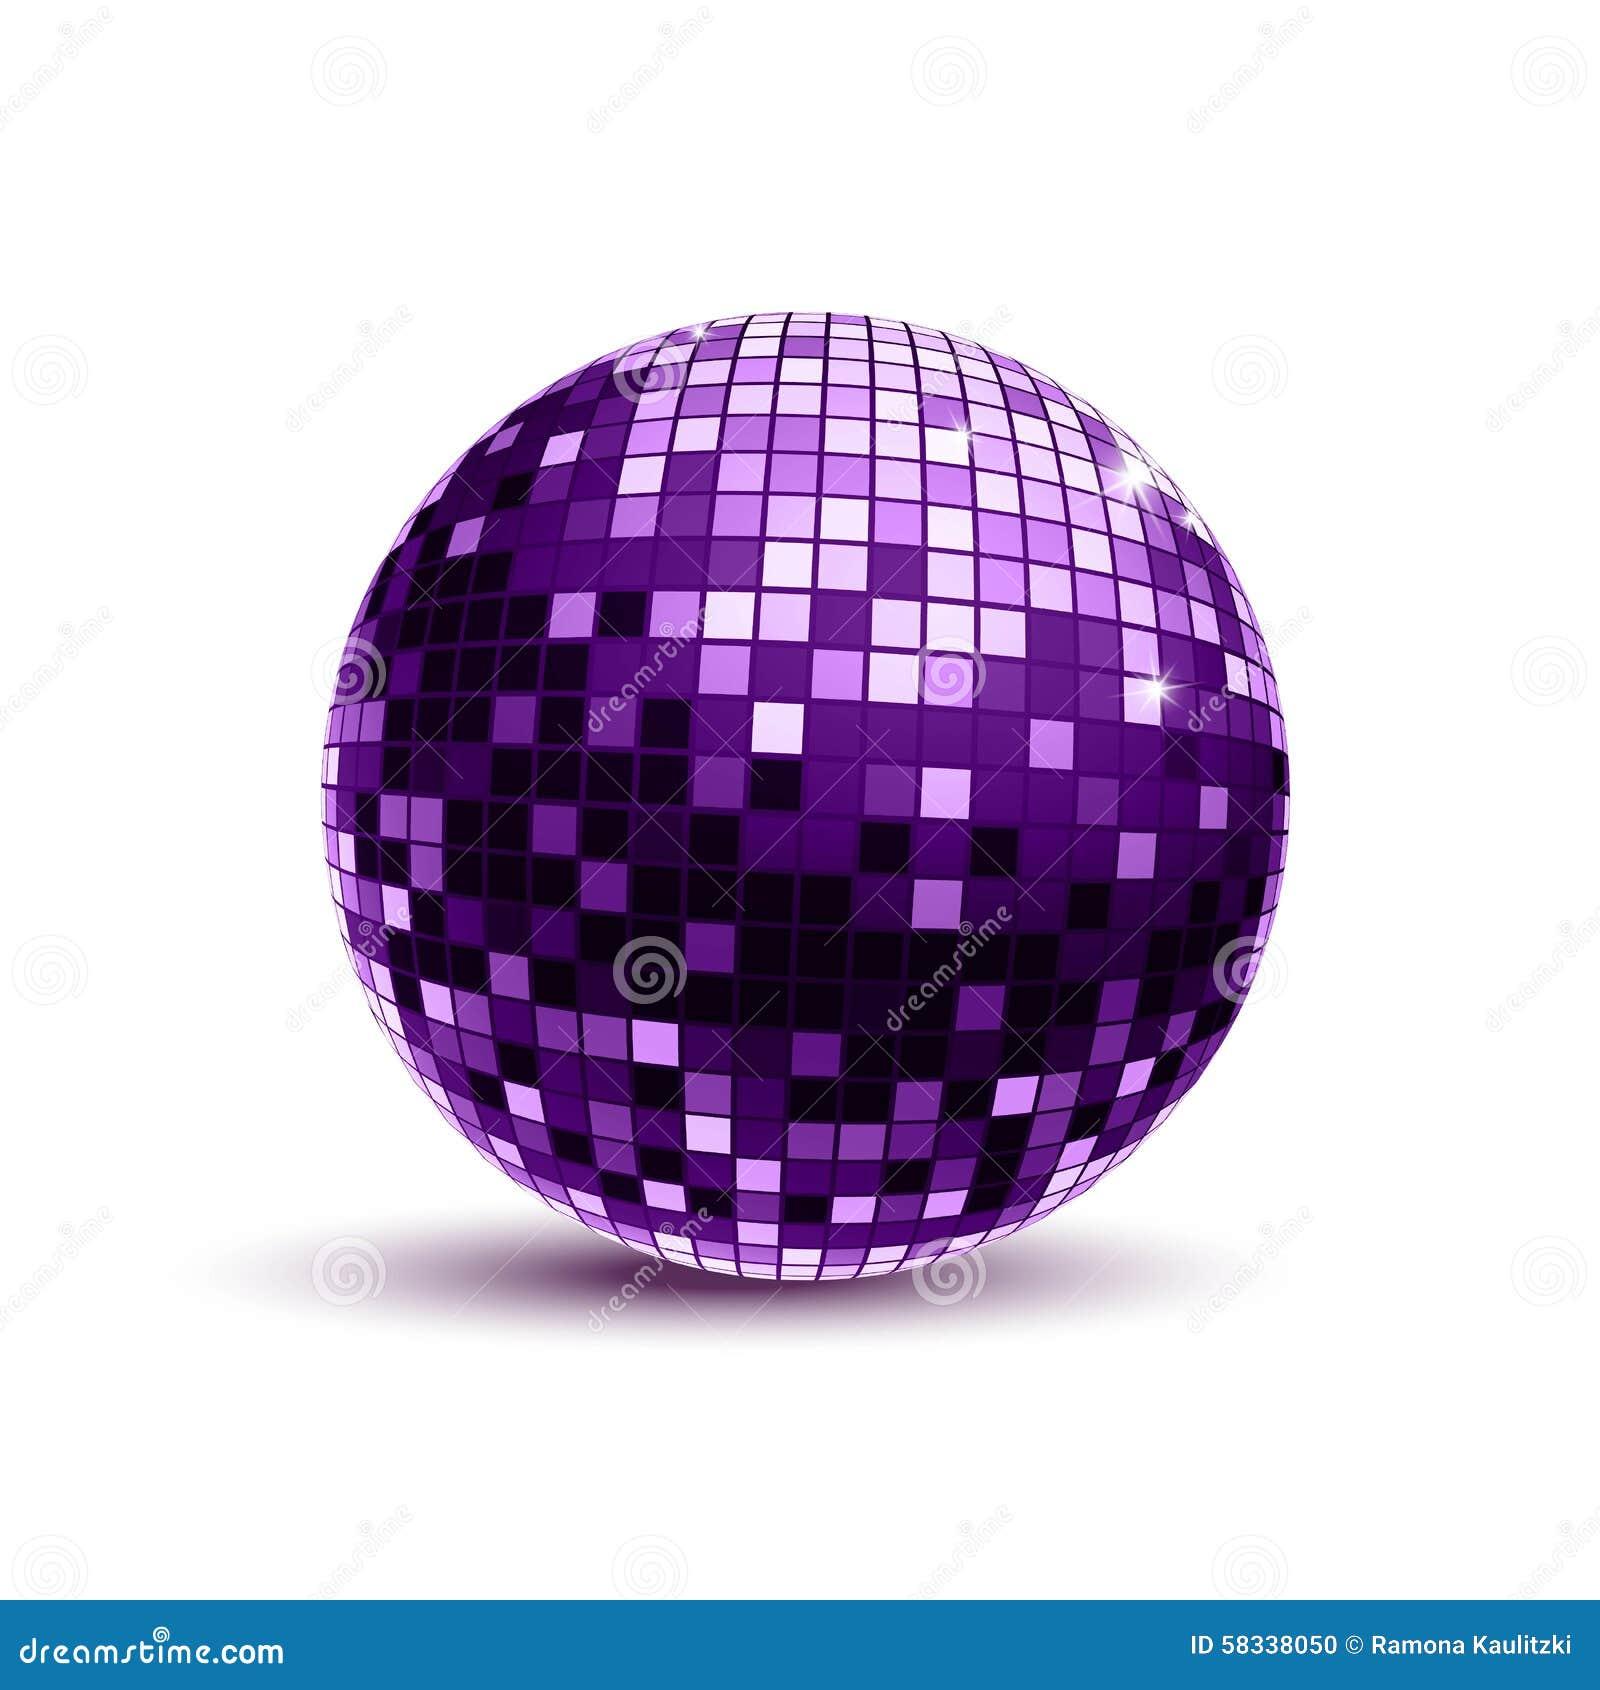 Purple disco ball stock illustration illustration of - Bola de discoteca de colores ...